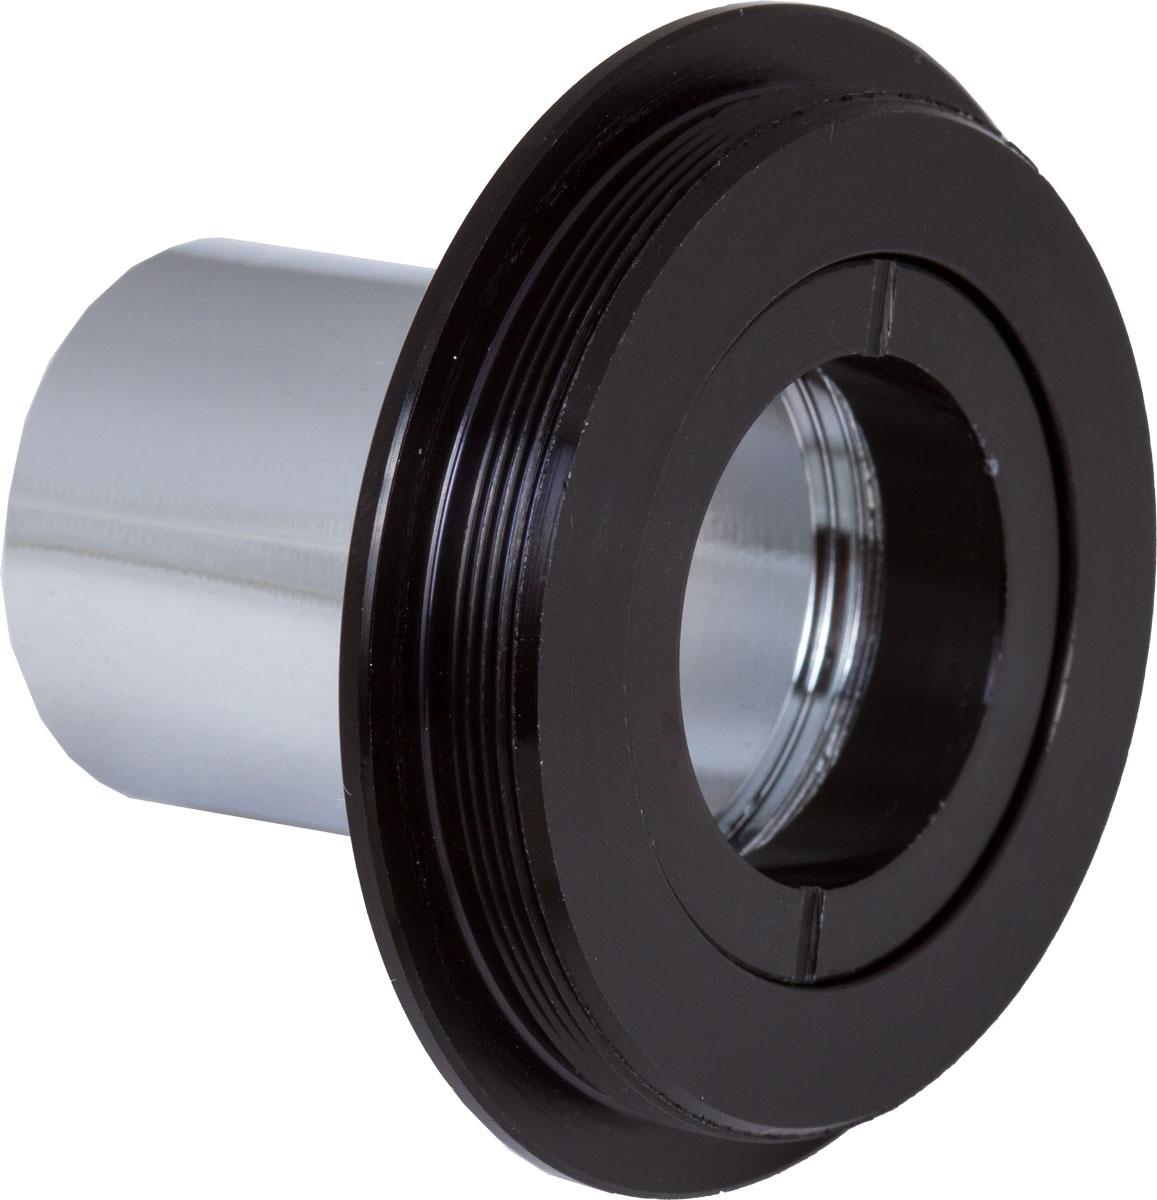 Bresser 69823 фотоадаптер для микроскопов 23 мм